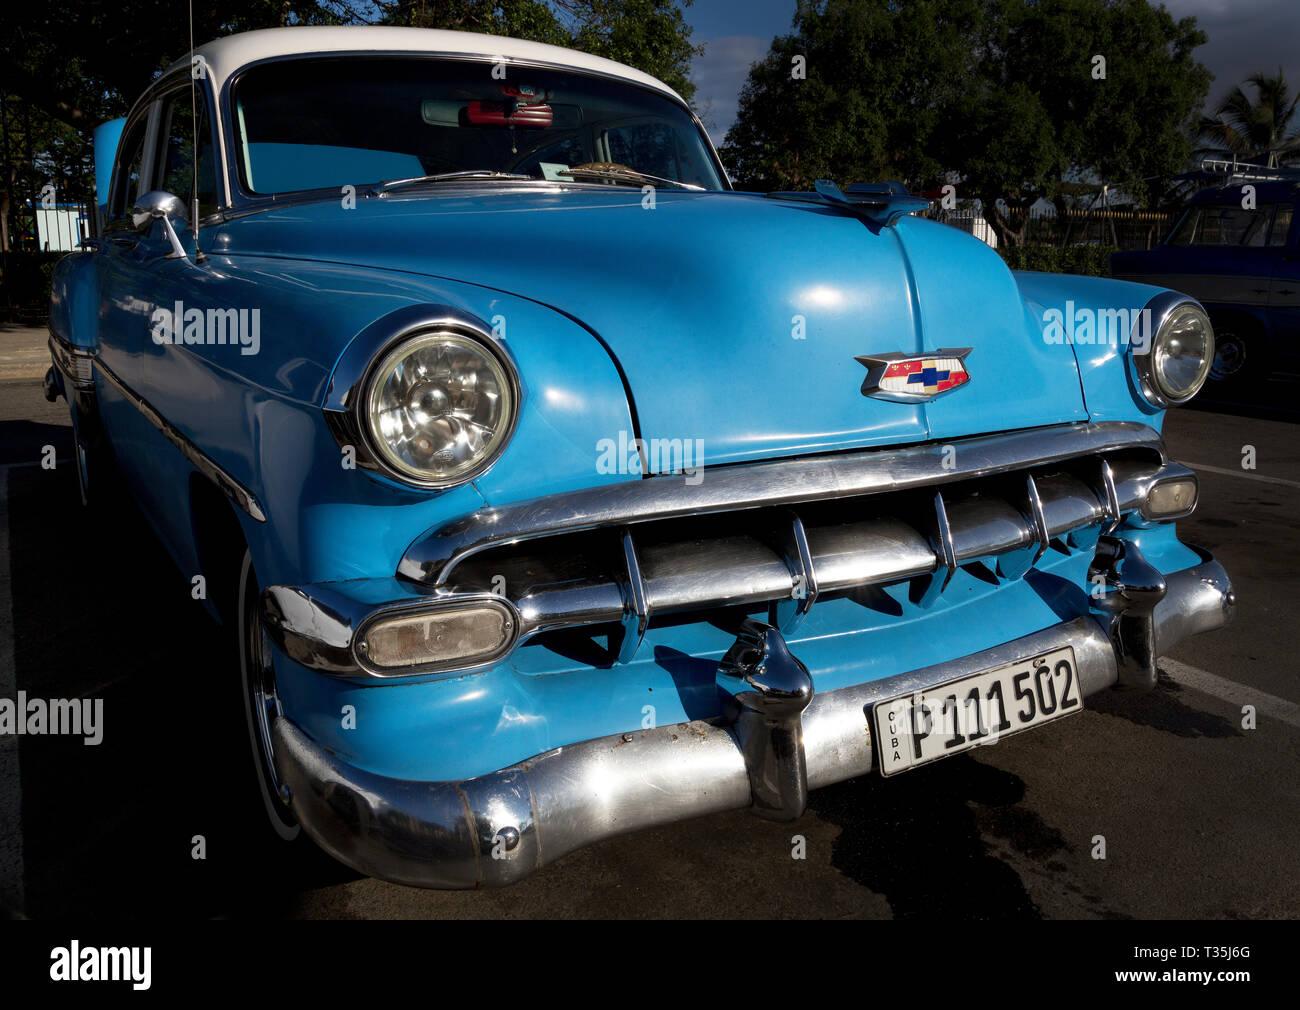 1952 Chevy Bel Air hard top parked in Havana, Cuba - Stock Image